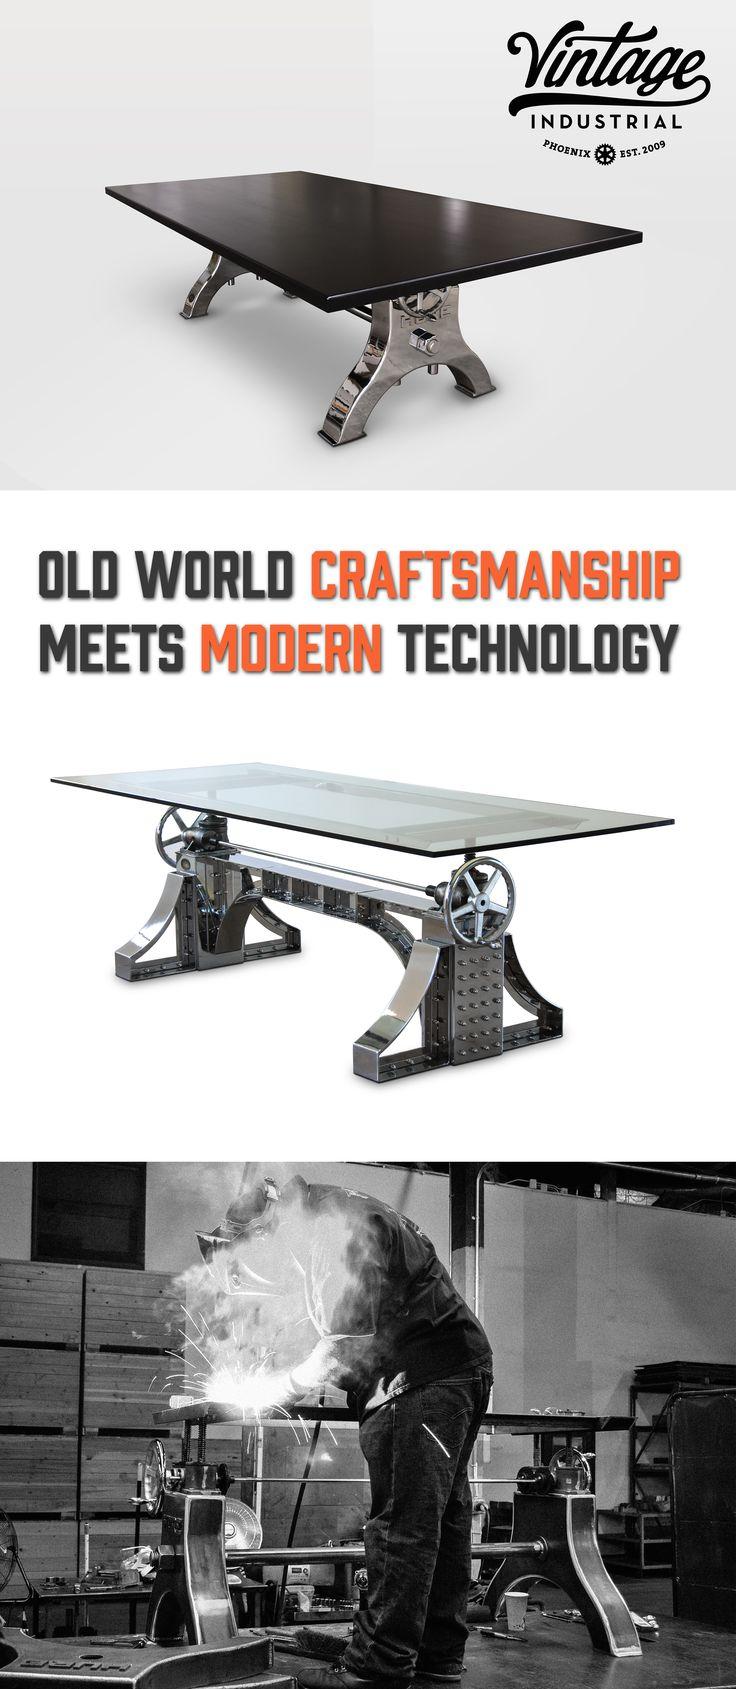 Post industrial conference table vintage industrial furniture - Helicoid Table Vintage Industrial Furnitureconference